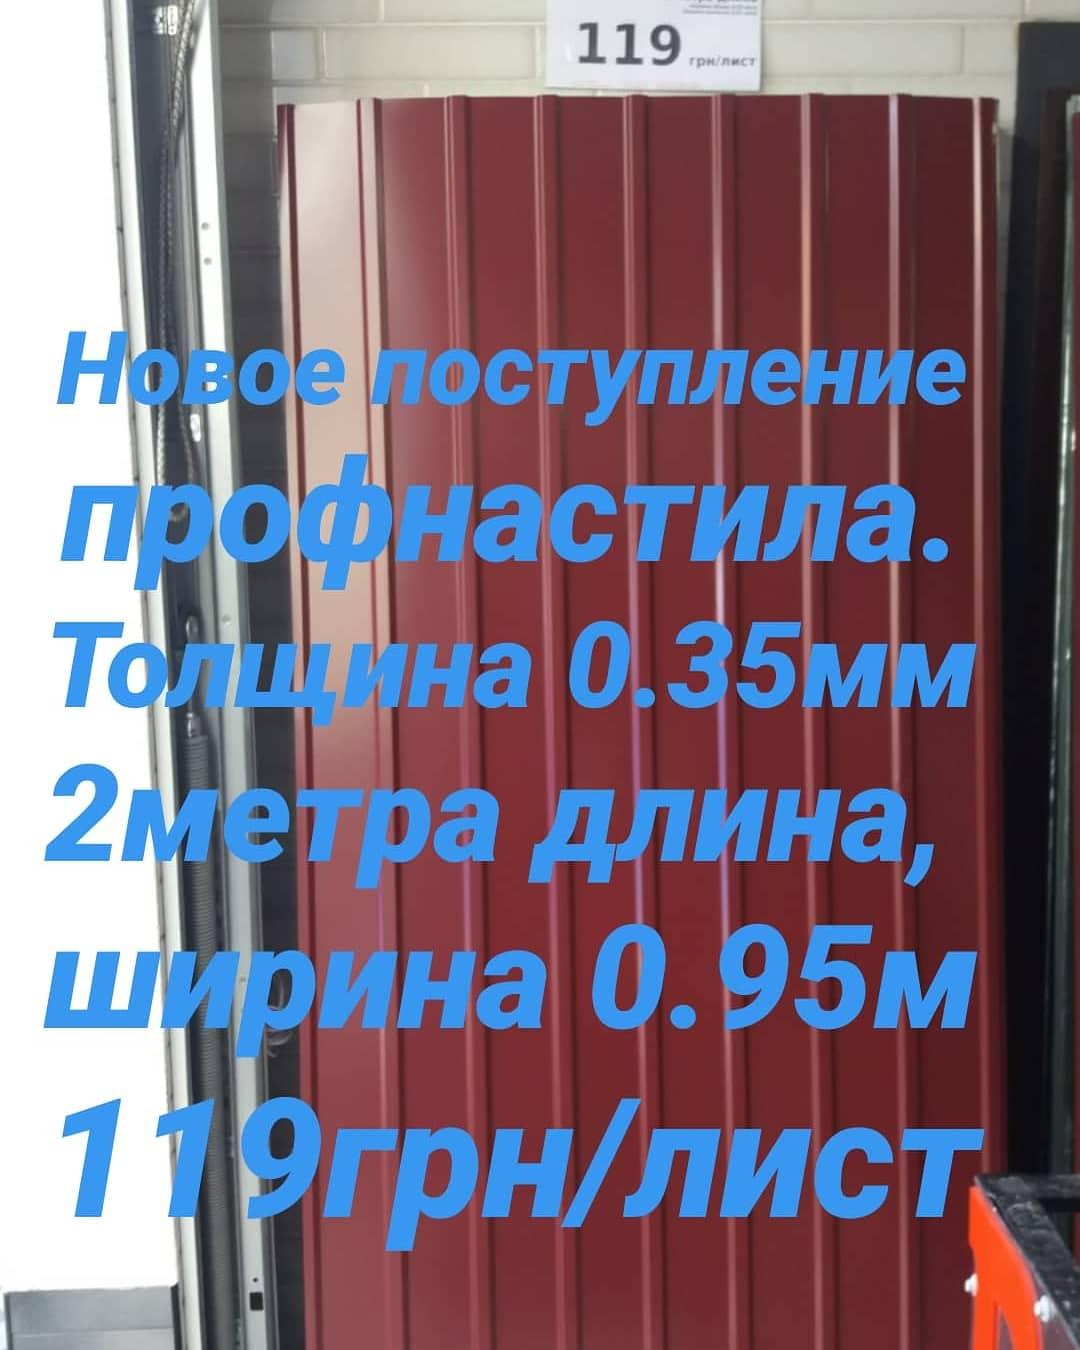 IMG_20200302_121600_024